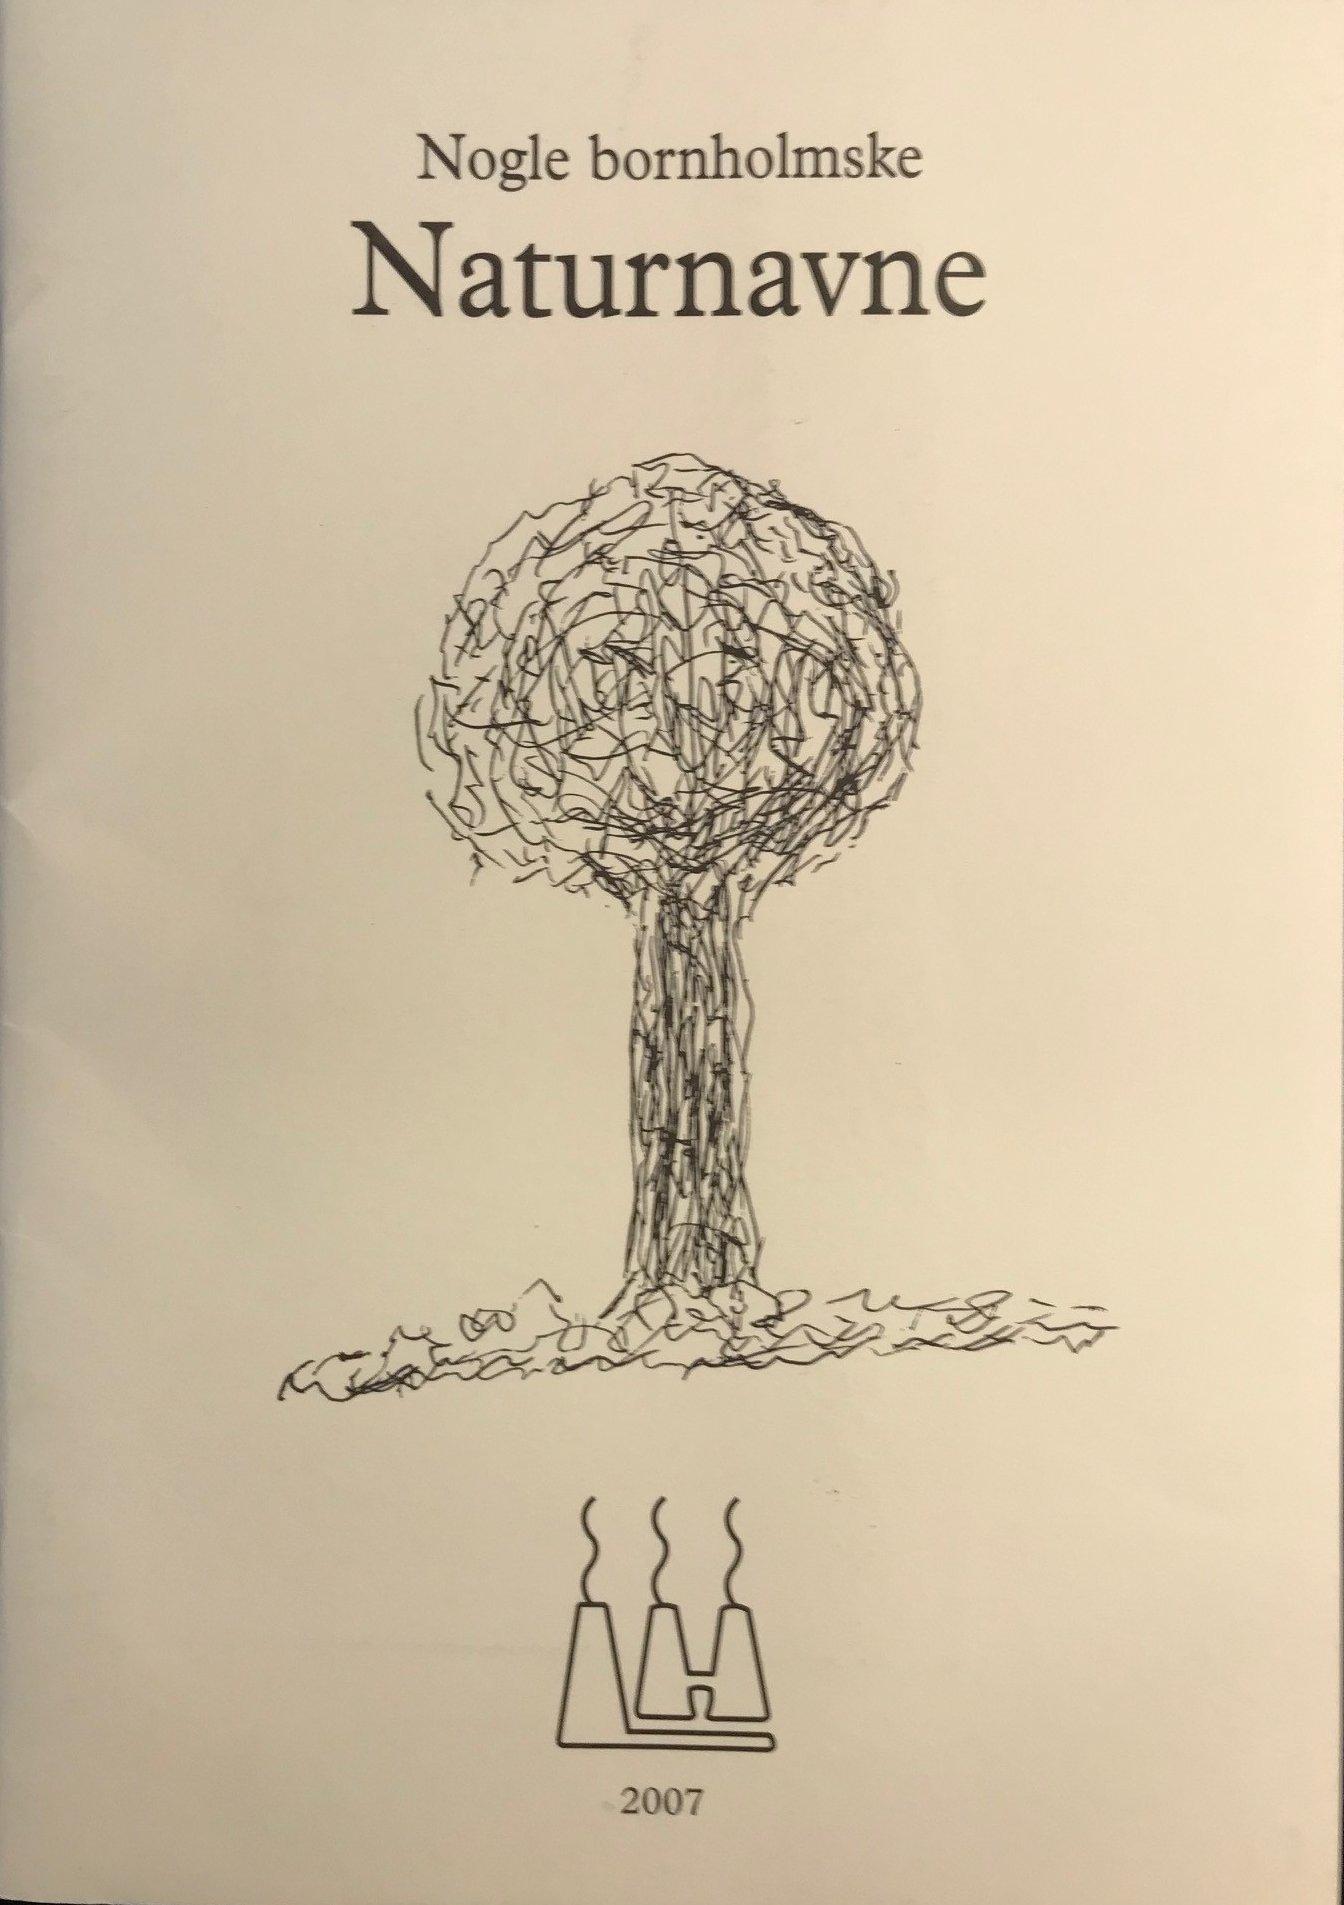 Nogle bornholmske naturnavne